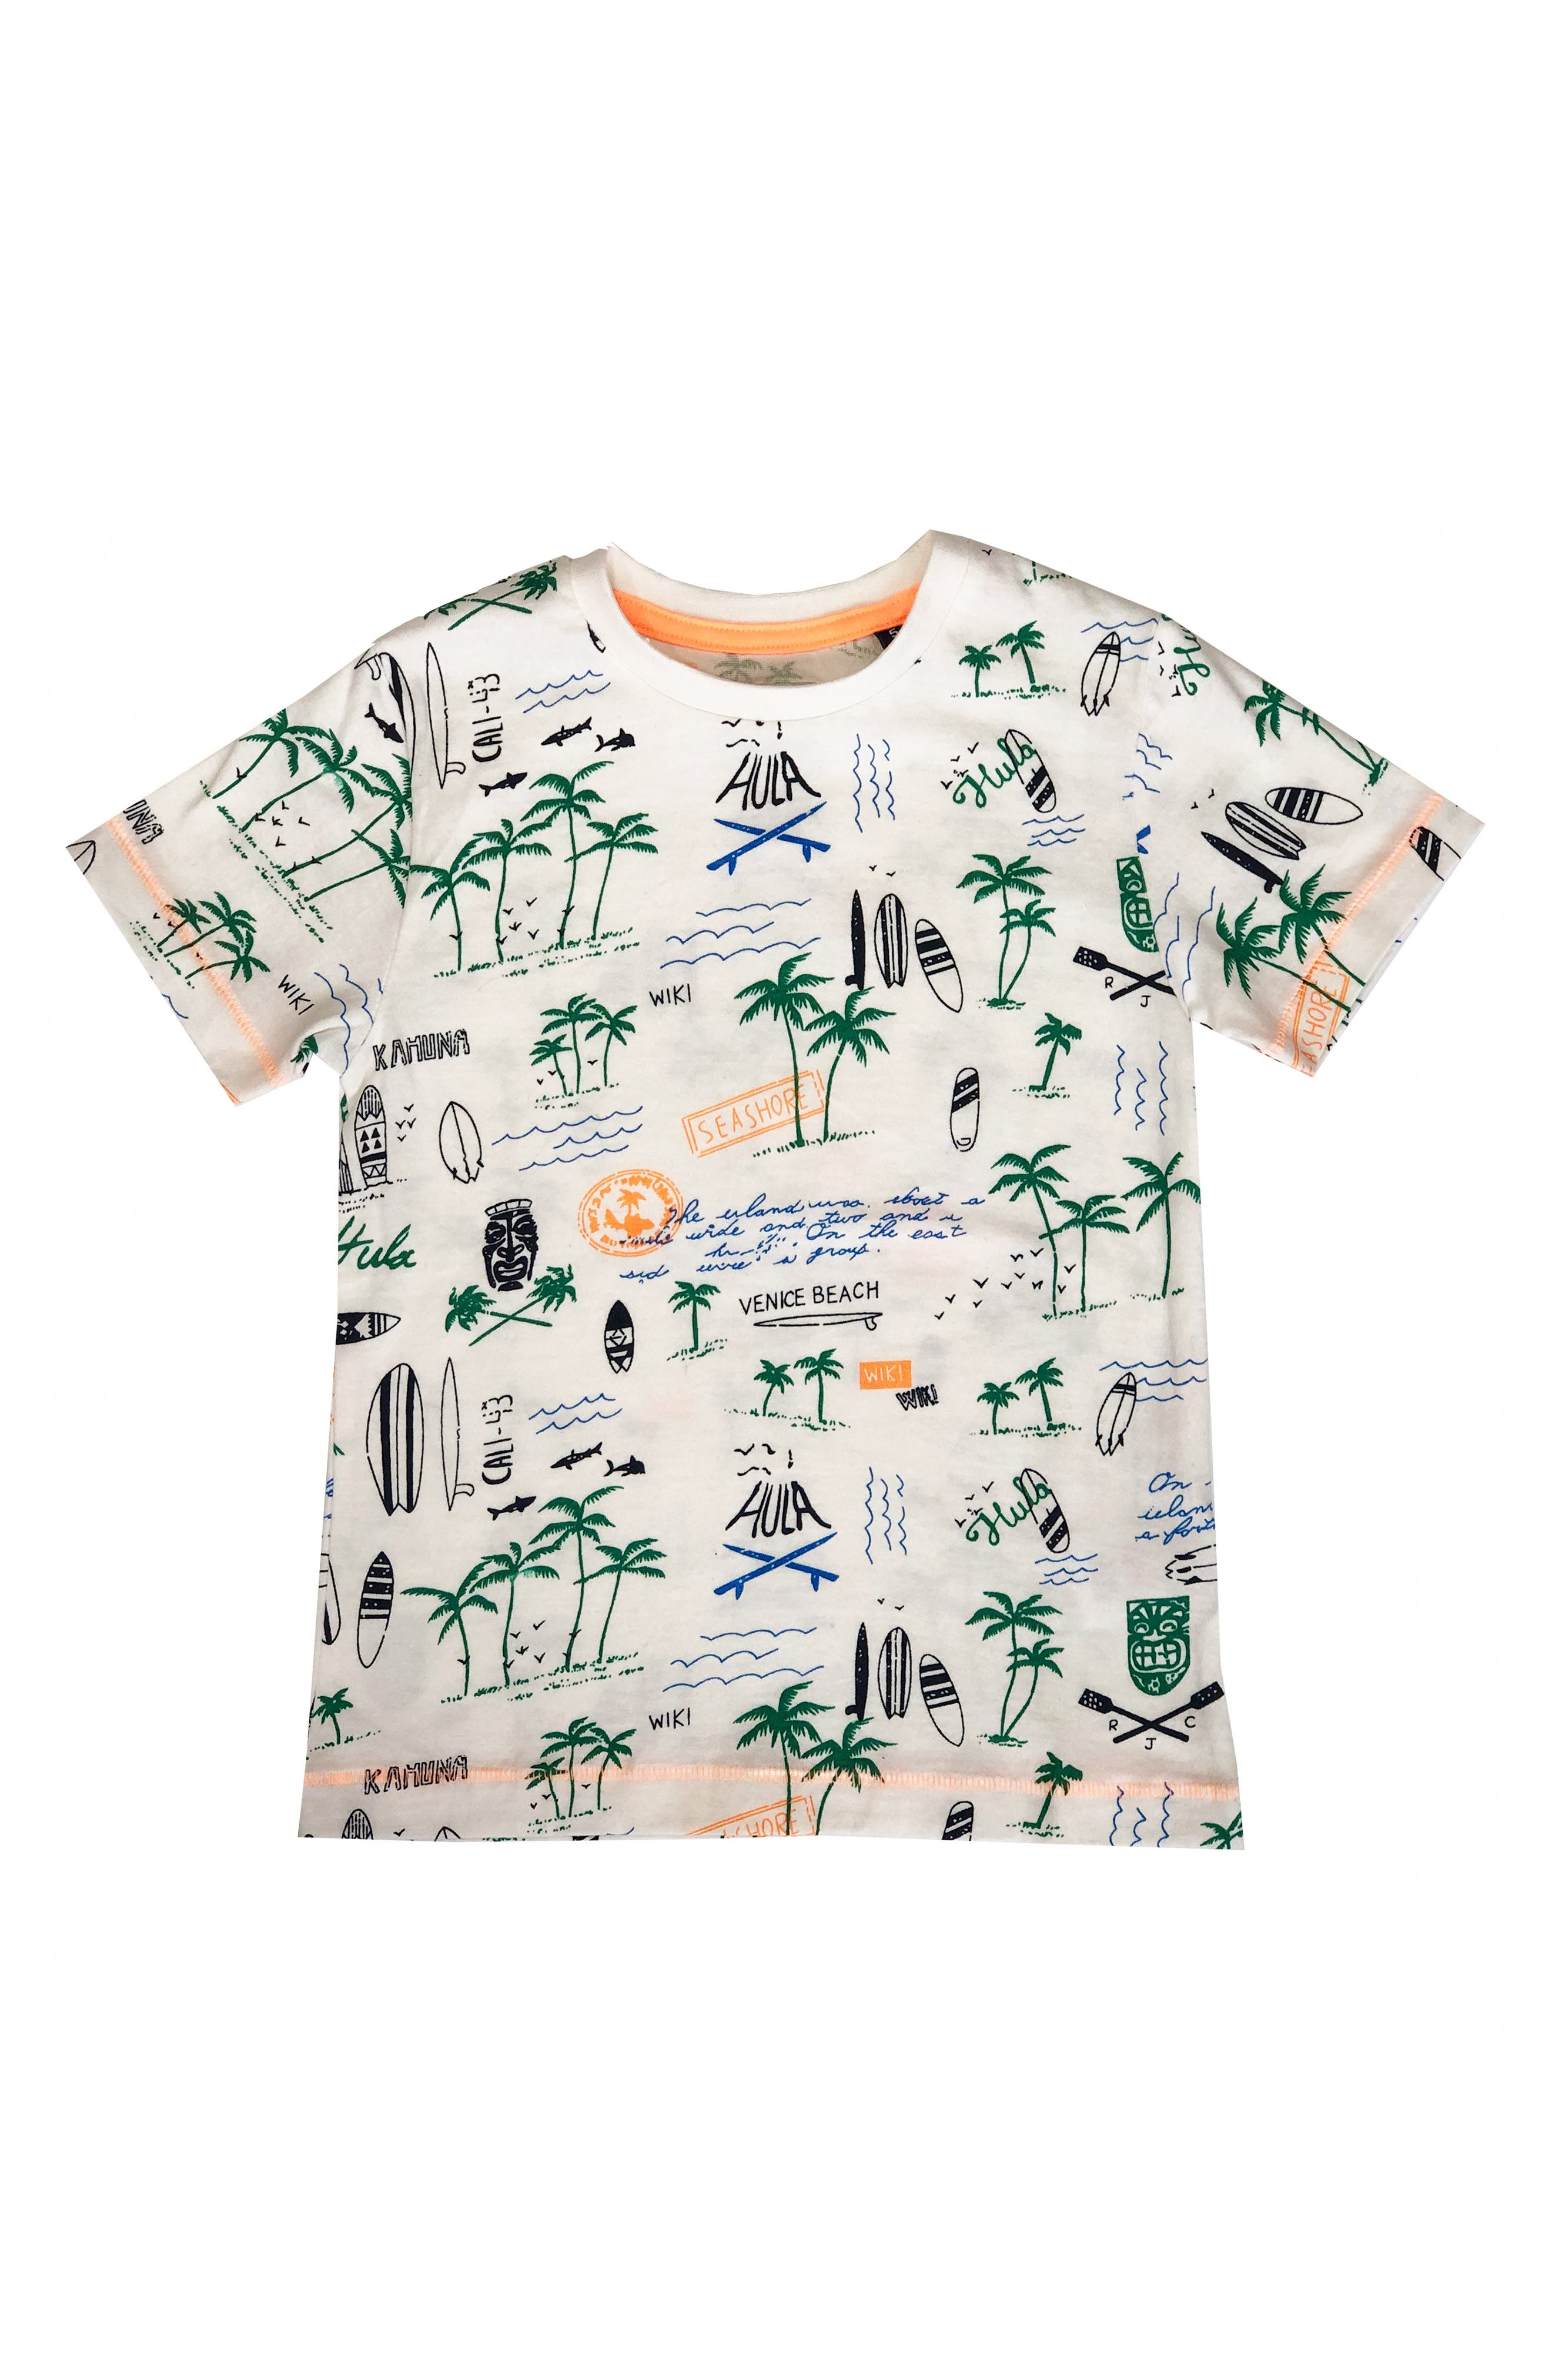 REBEL JAMES & CHARLI Tiki Print T-Shirt, Main, color, NATURAL